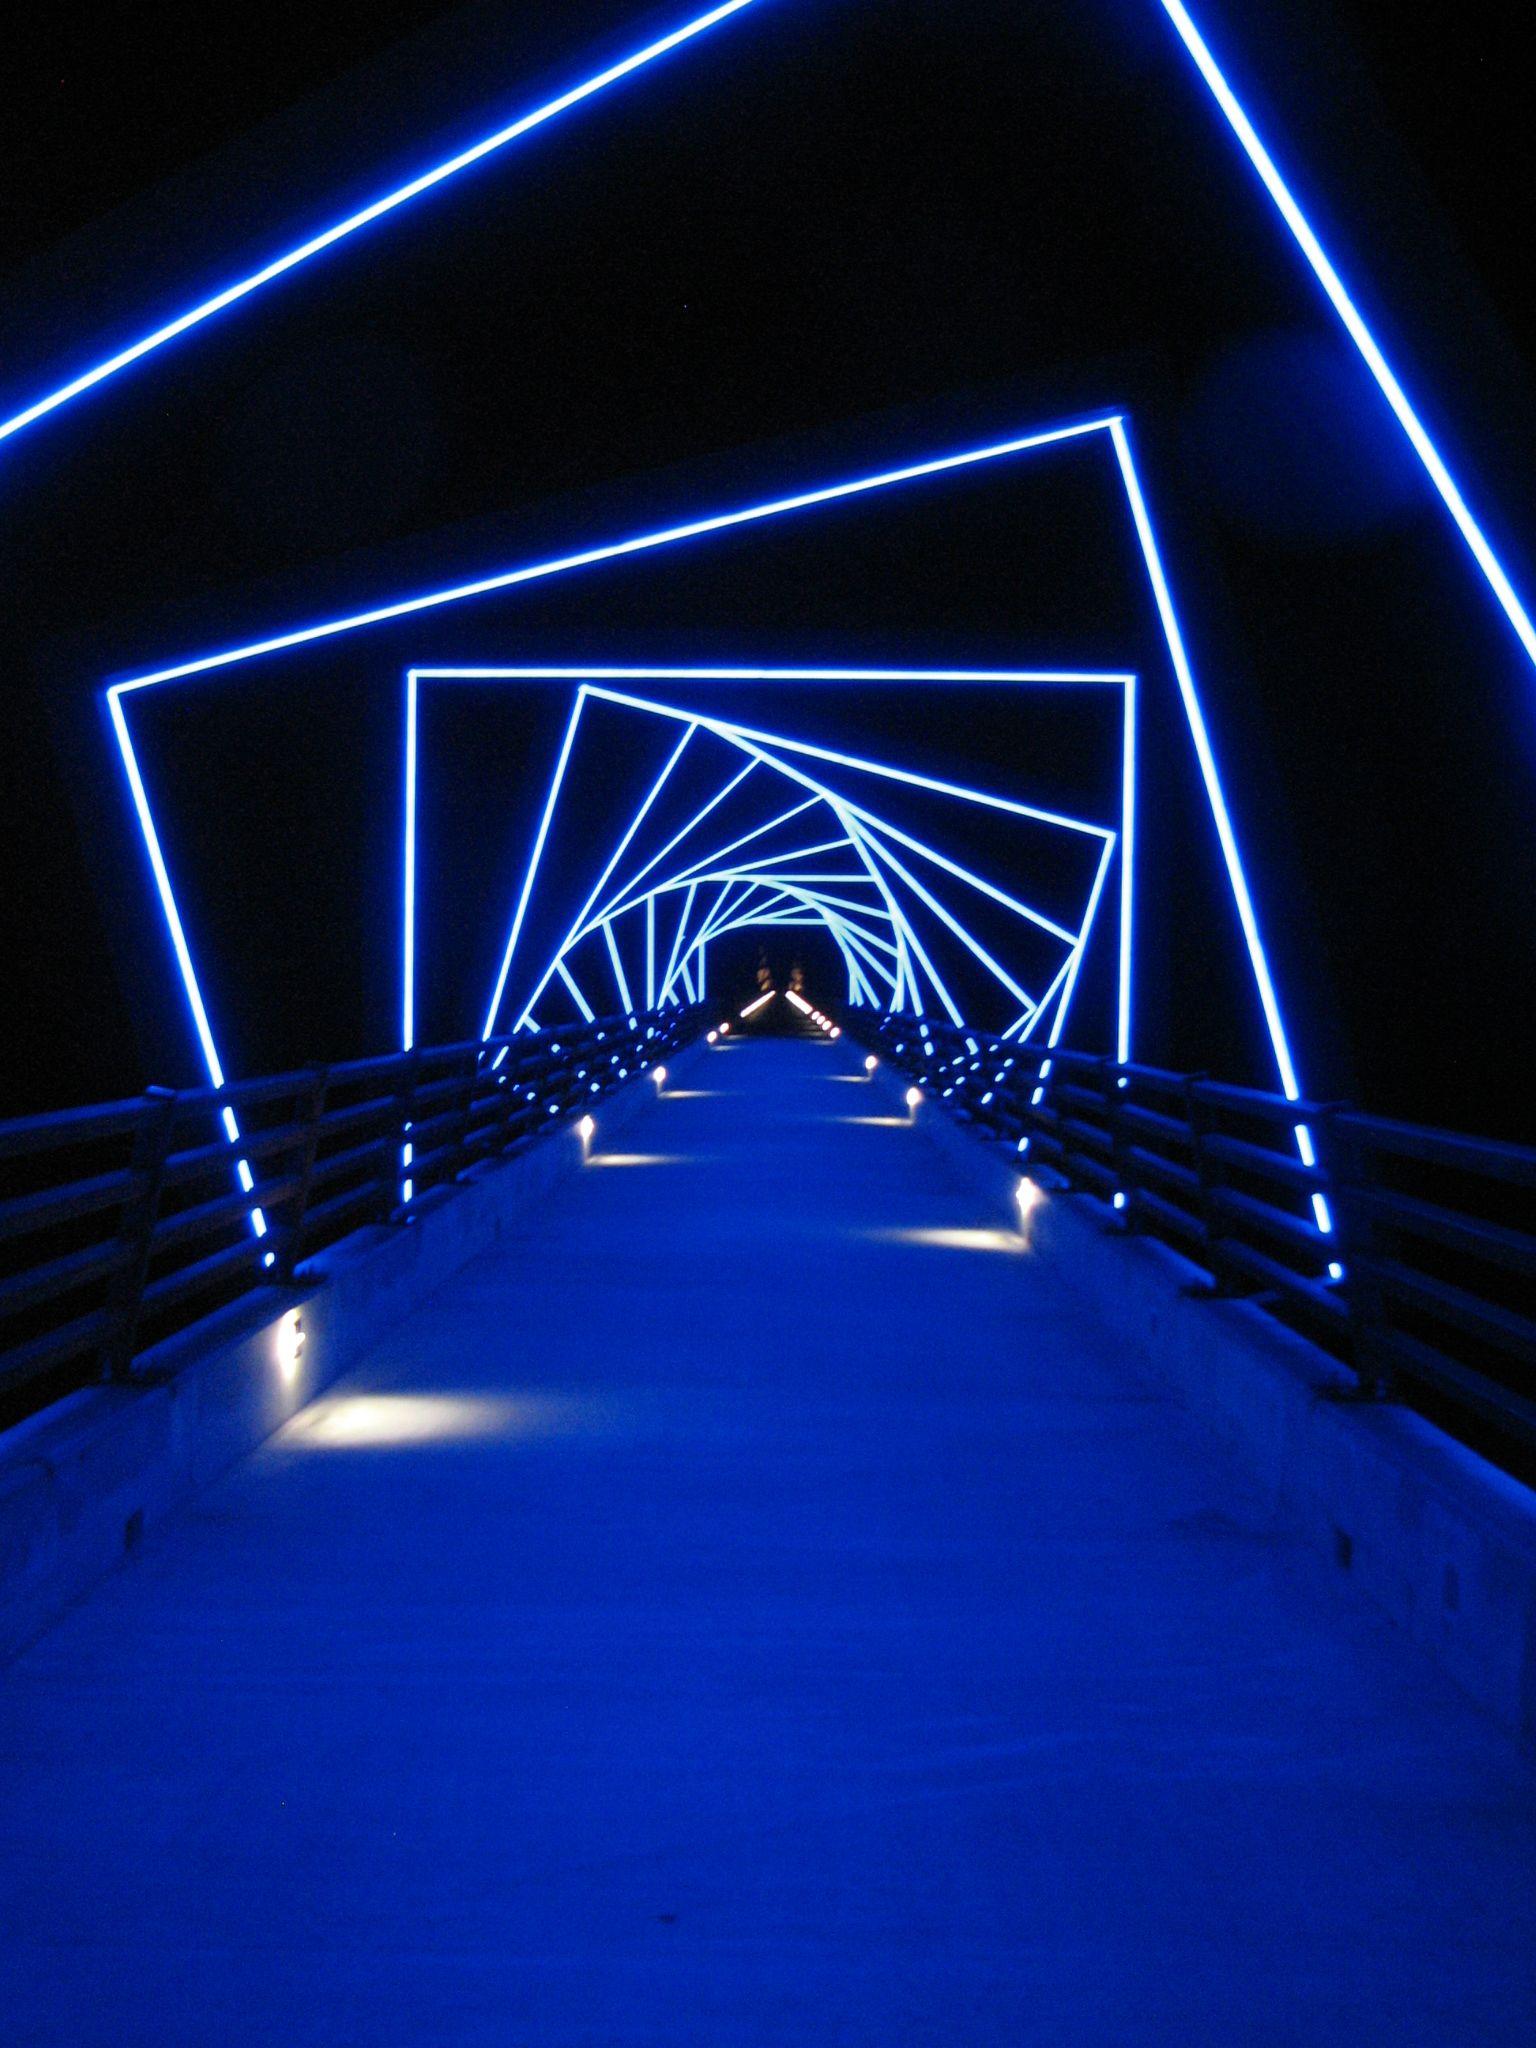 Tunnel of NEON lights  Outdoors  Blue aesthetic Light art Lighting